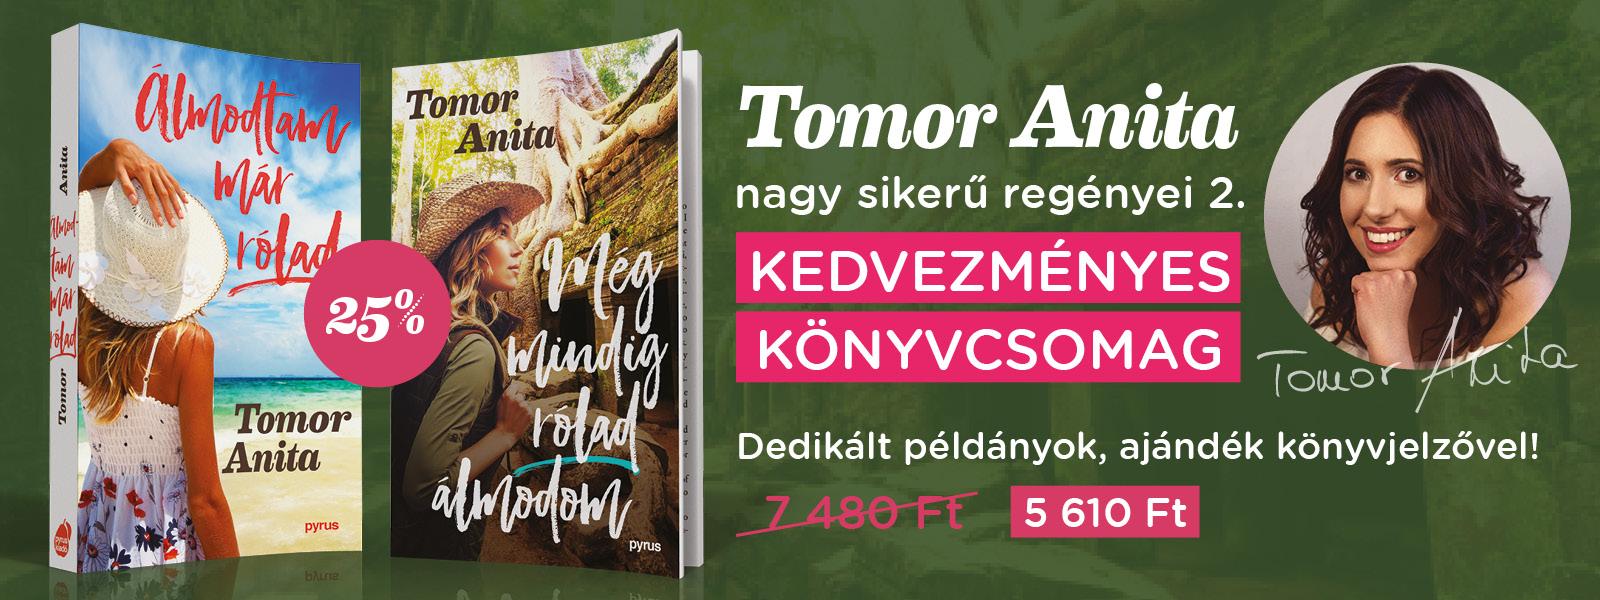 Tomor Anita könyvcsomag 2.